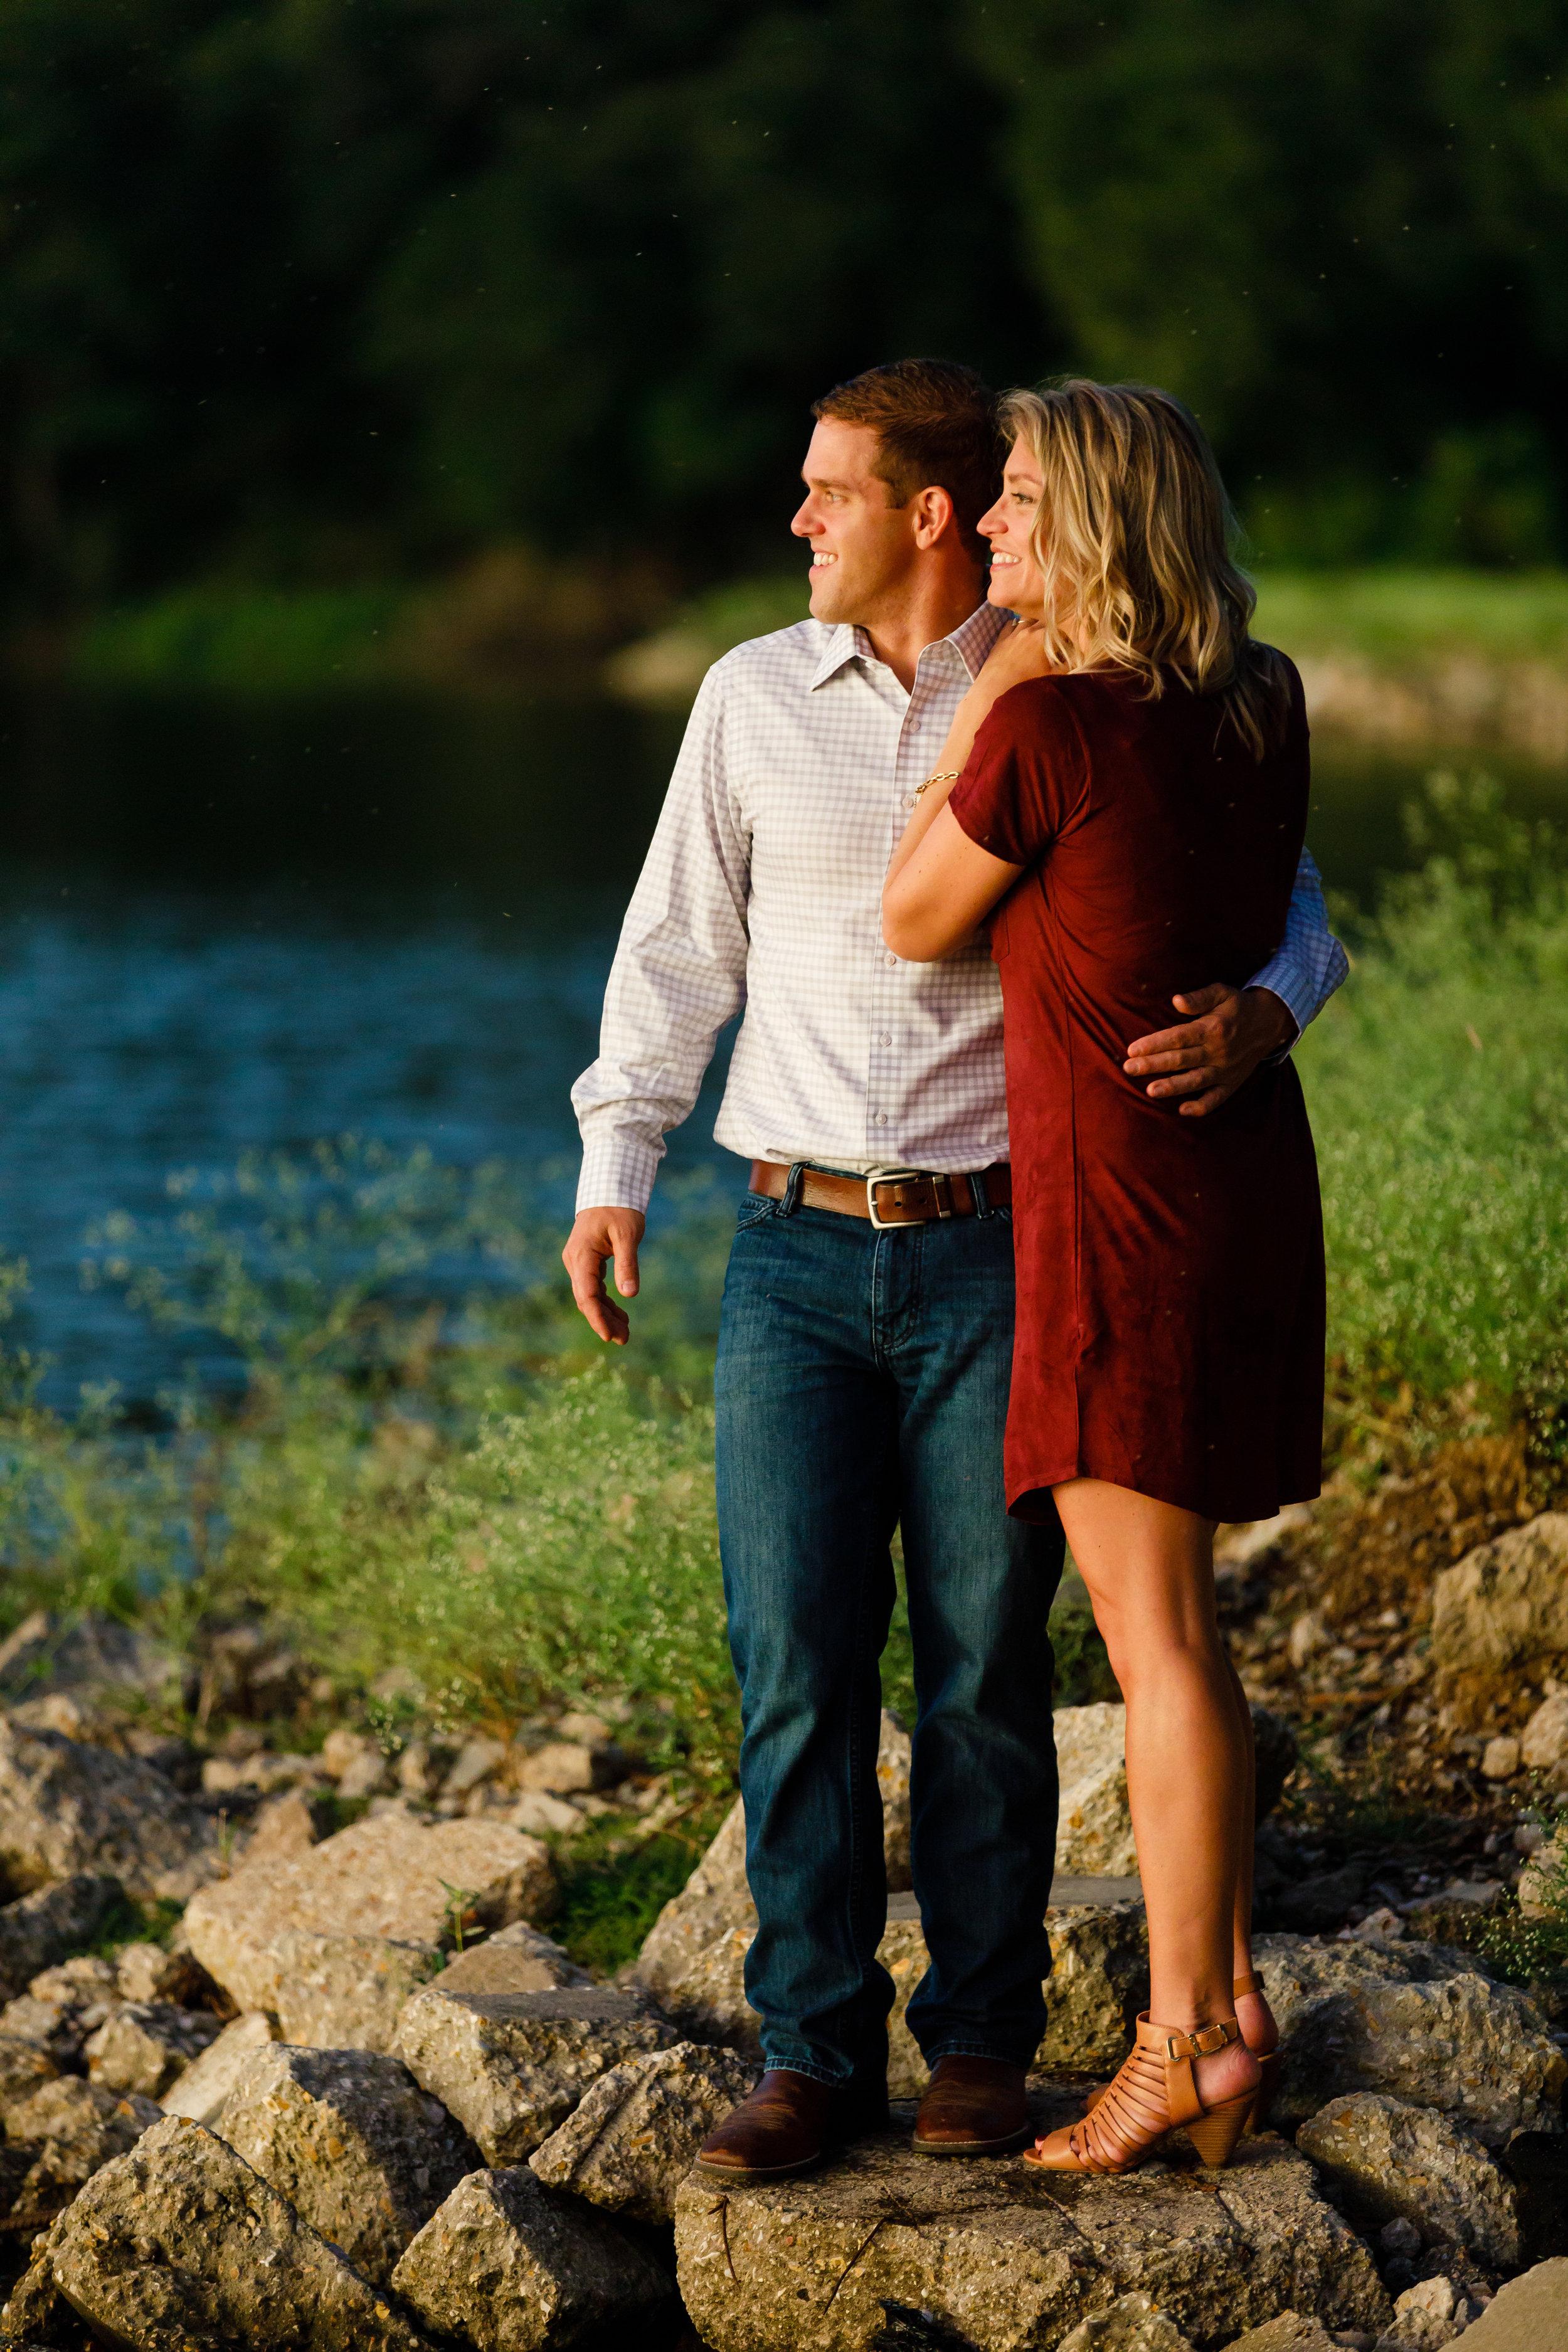 Youngsville-lafayette-portrait-family-wedding-photographer-9111.jpg